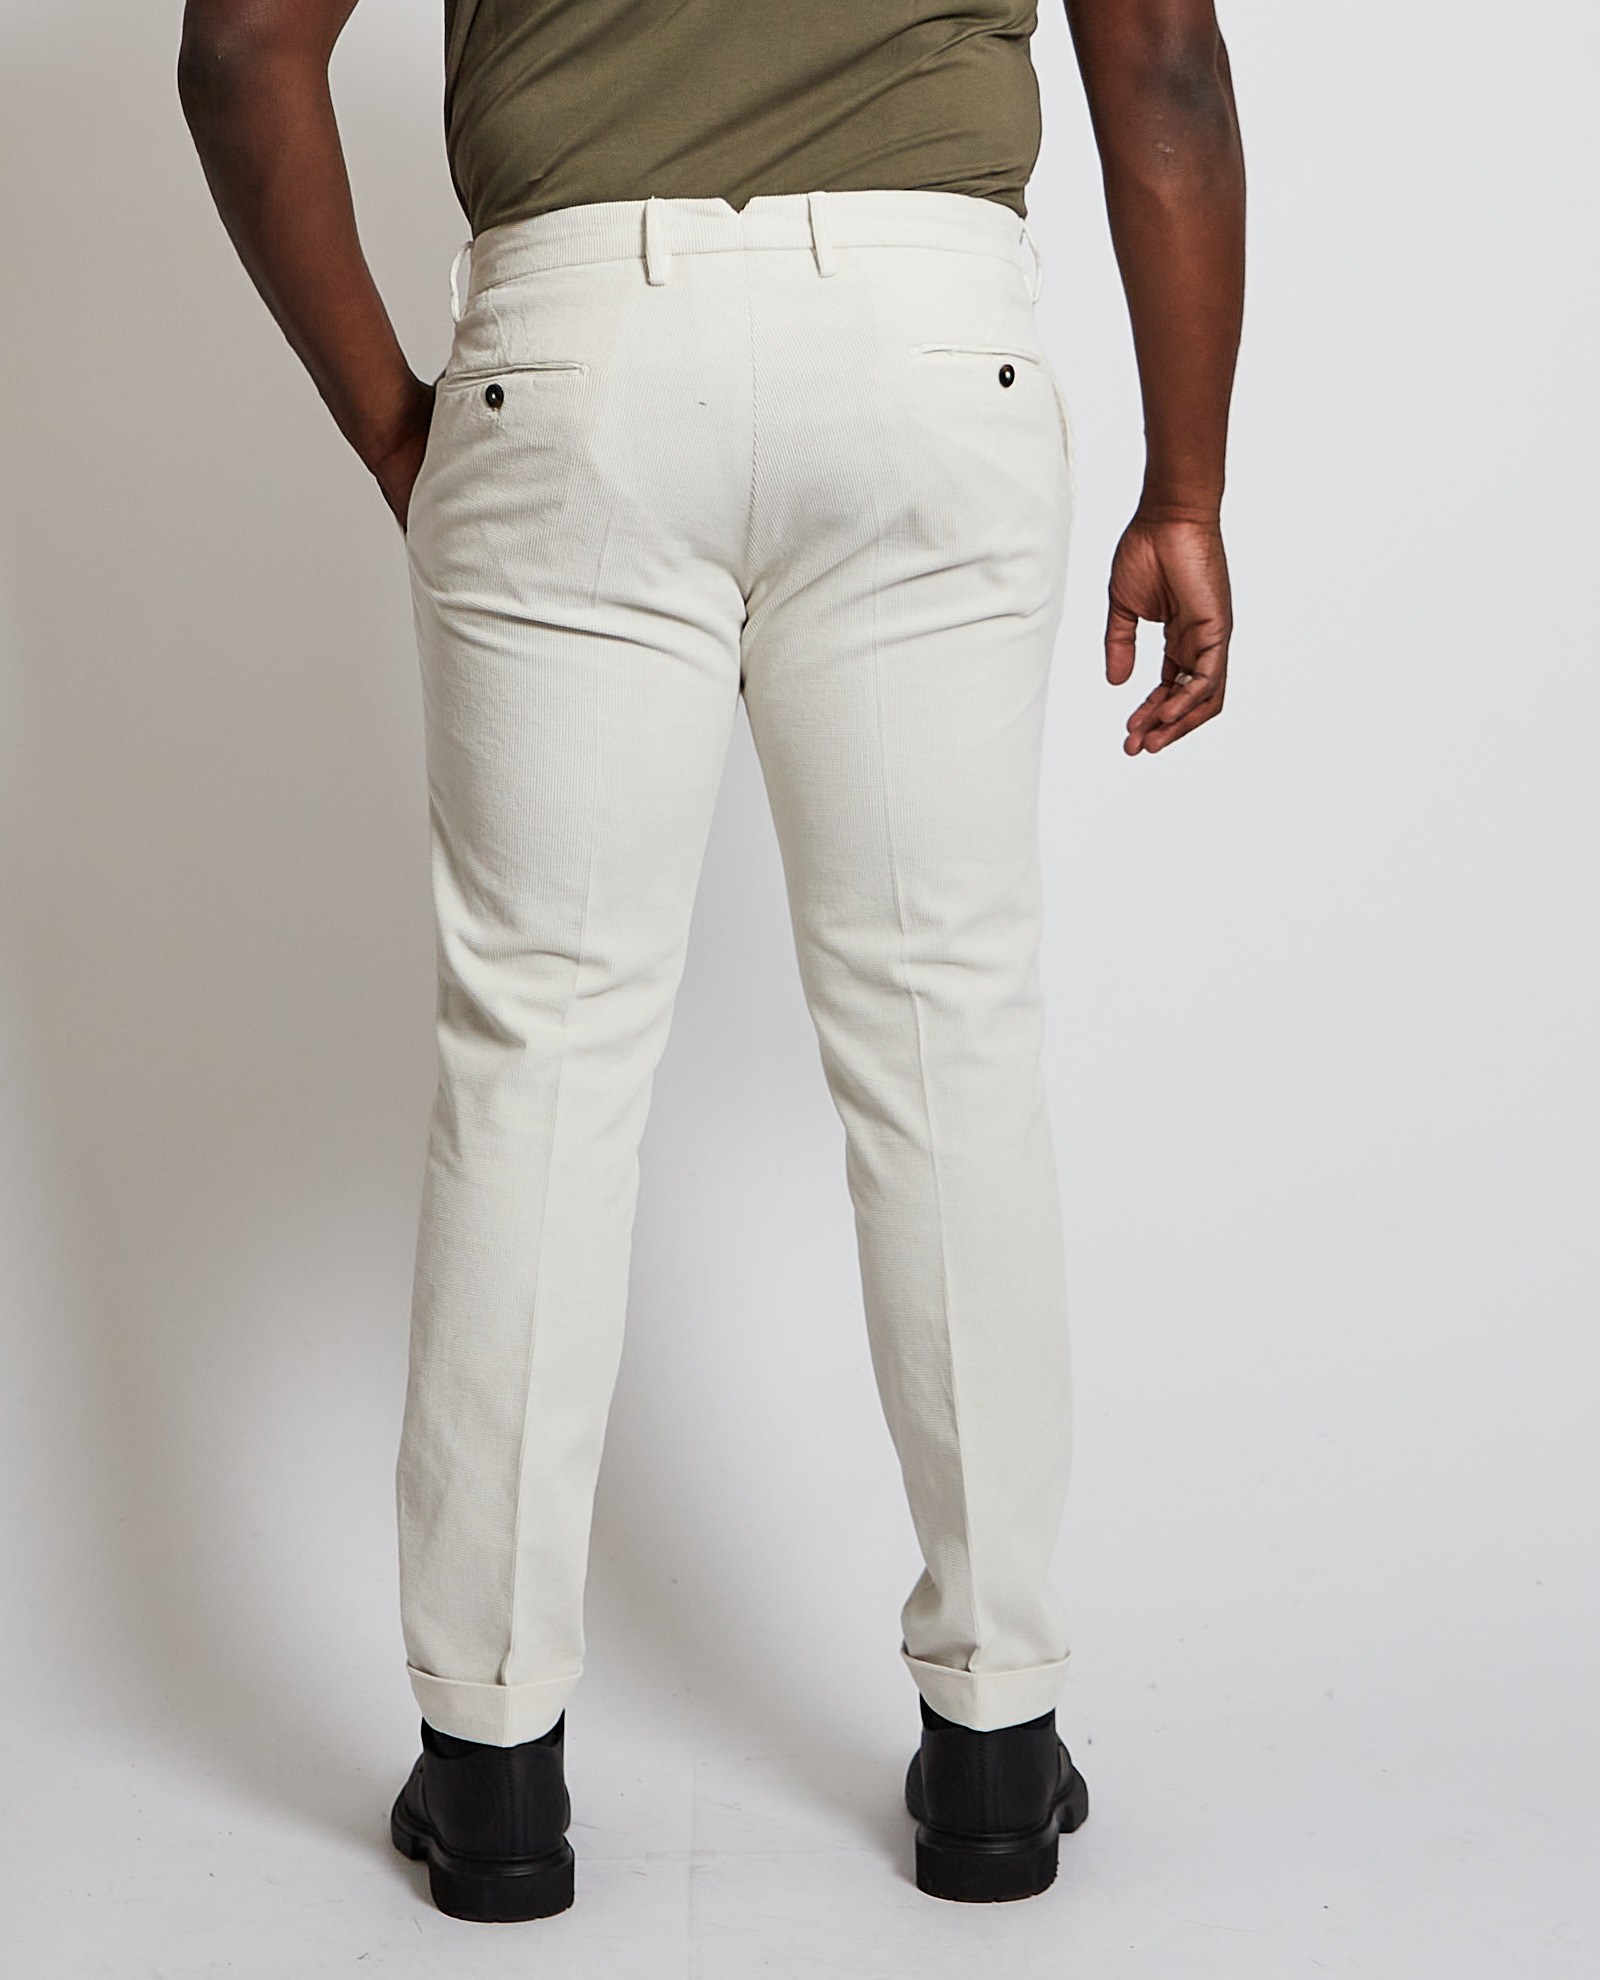 Pantalone Michael Coal MICHAEL COAL   Pantalone   MCFR2.2842009